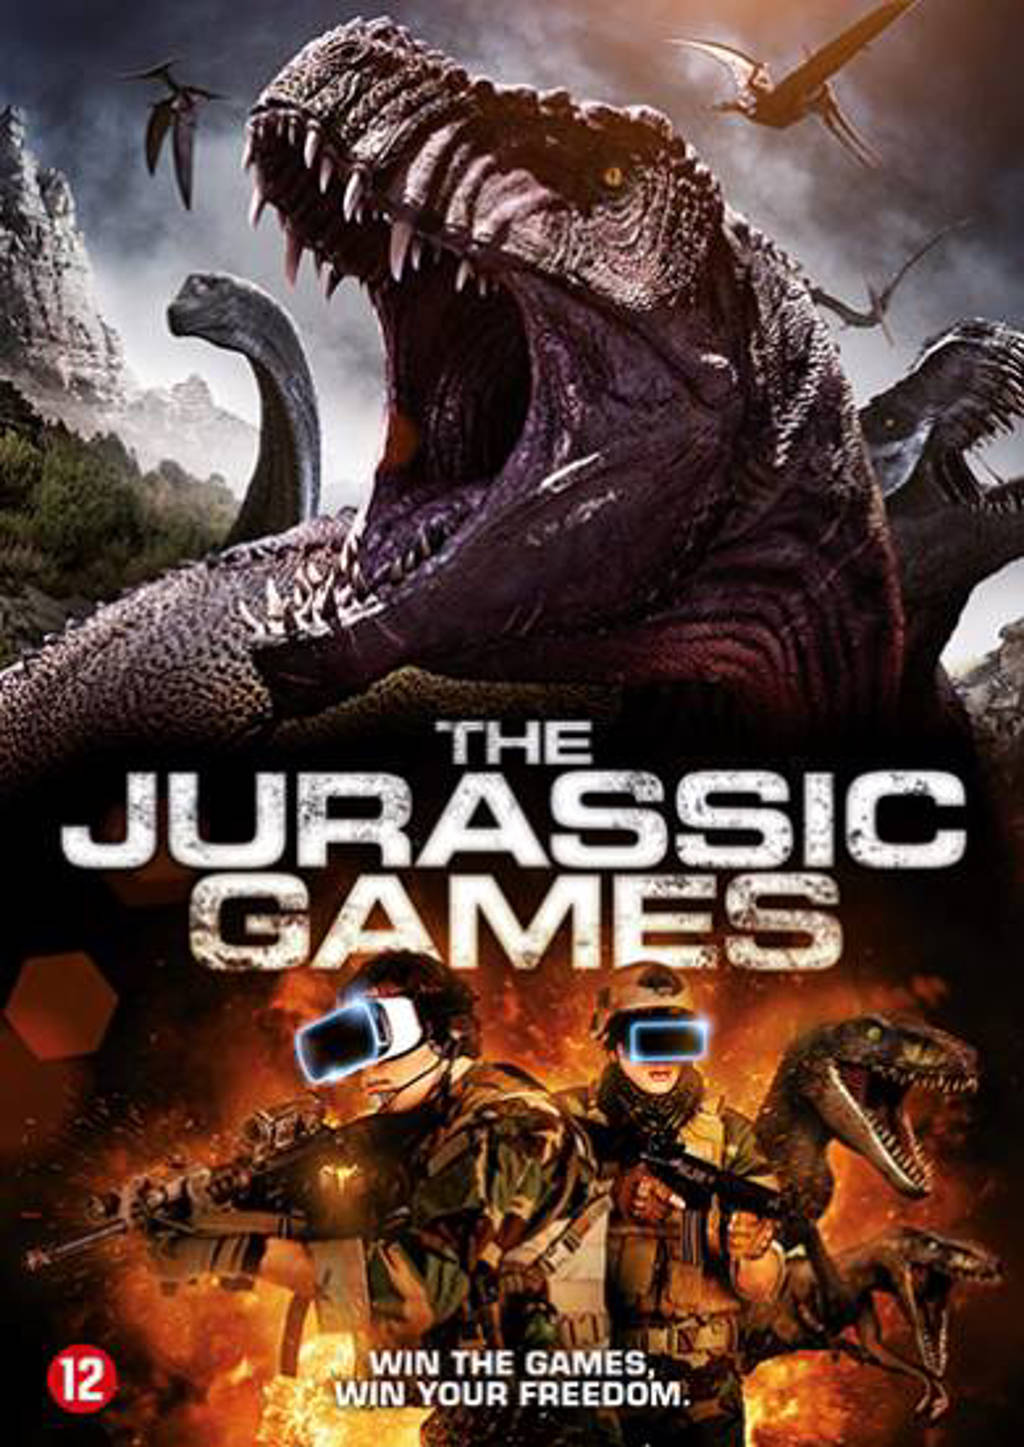 Jurassic games (DVD)